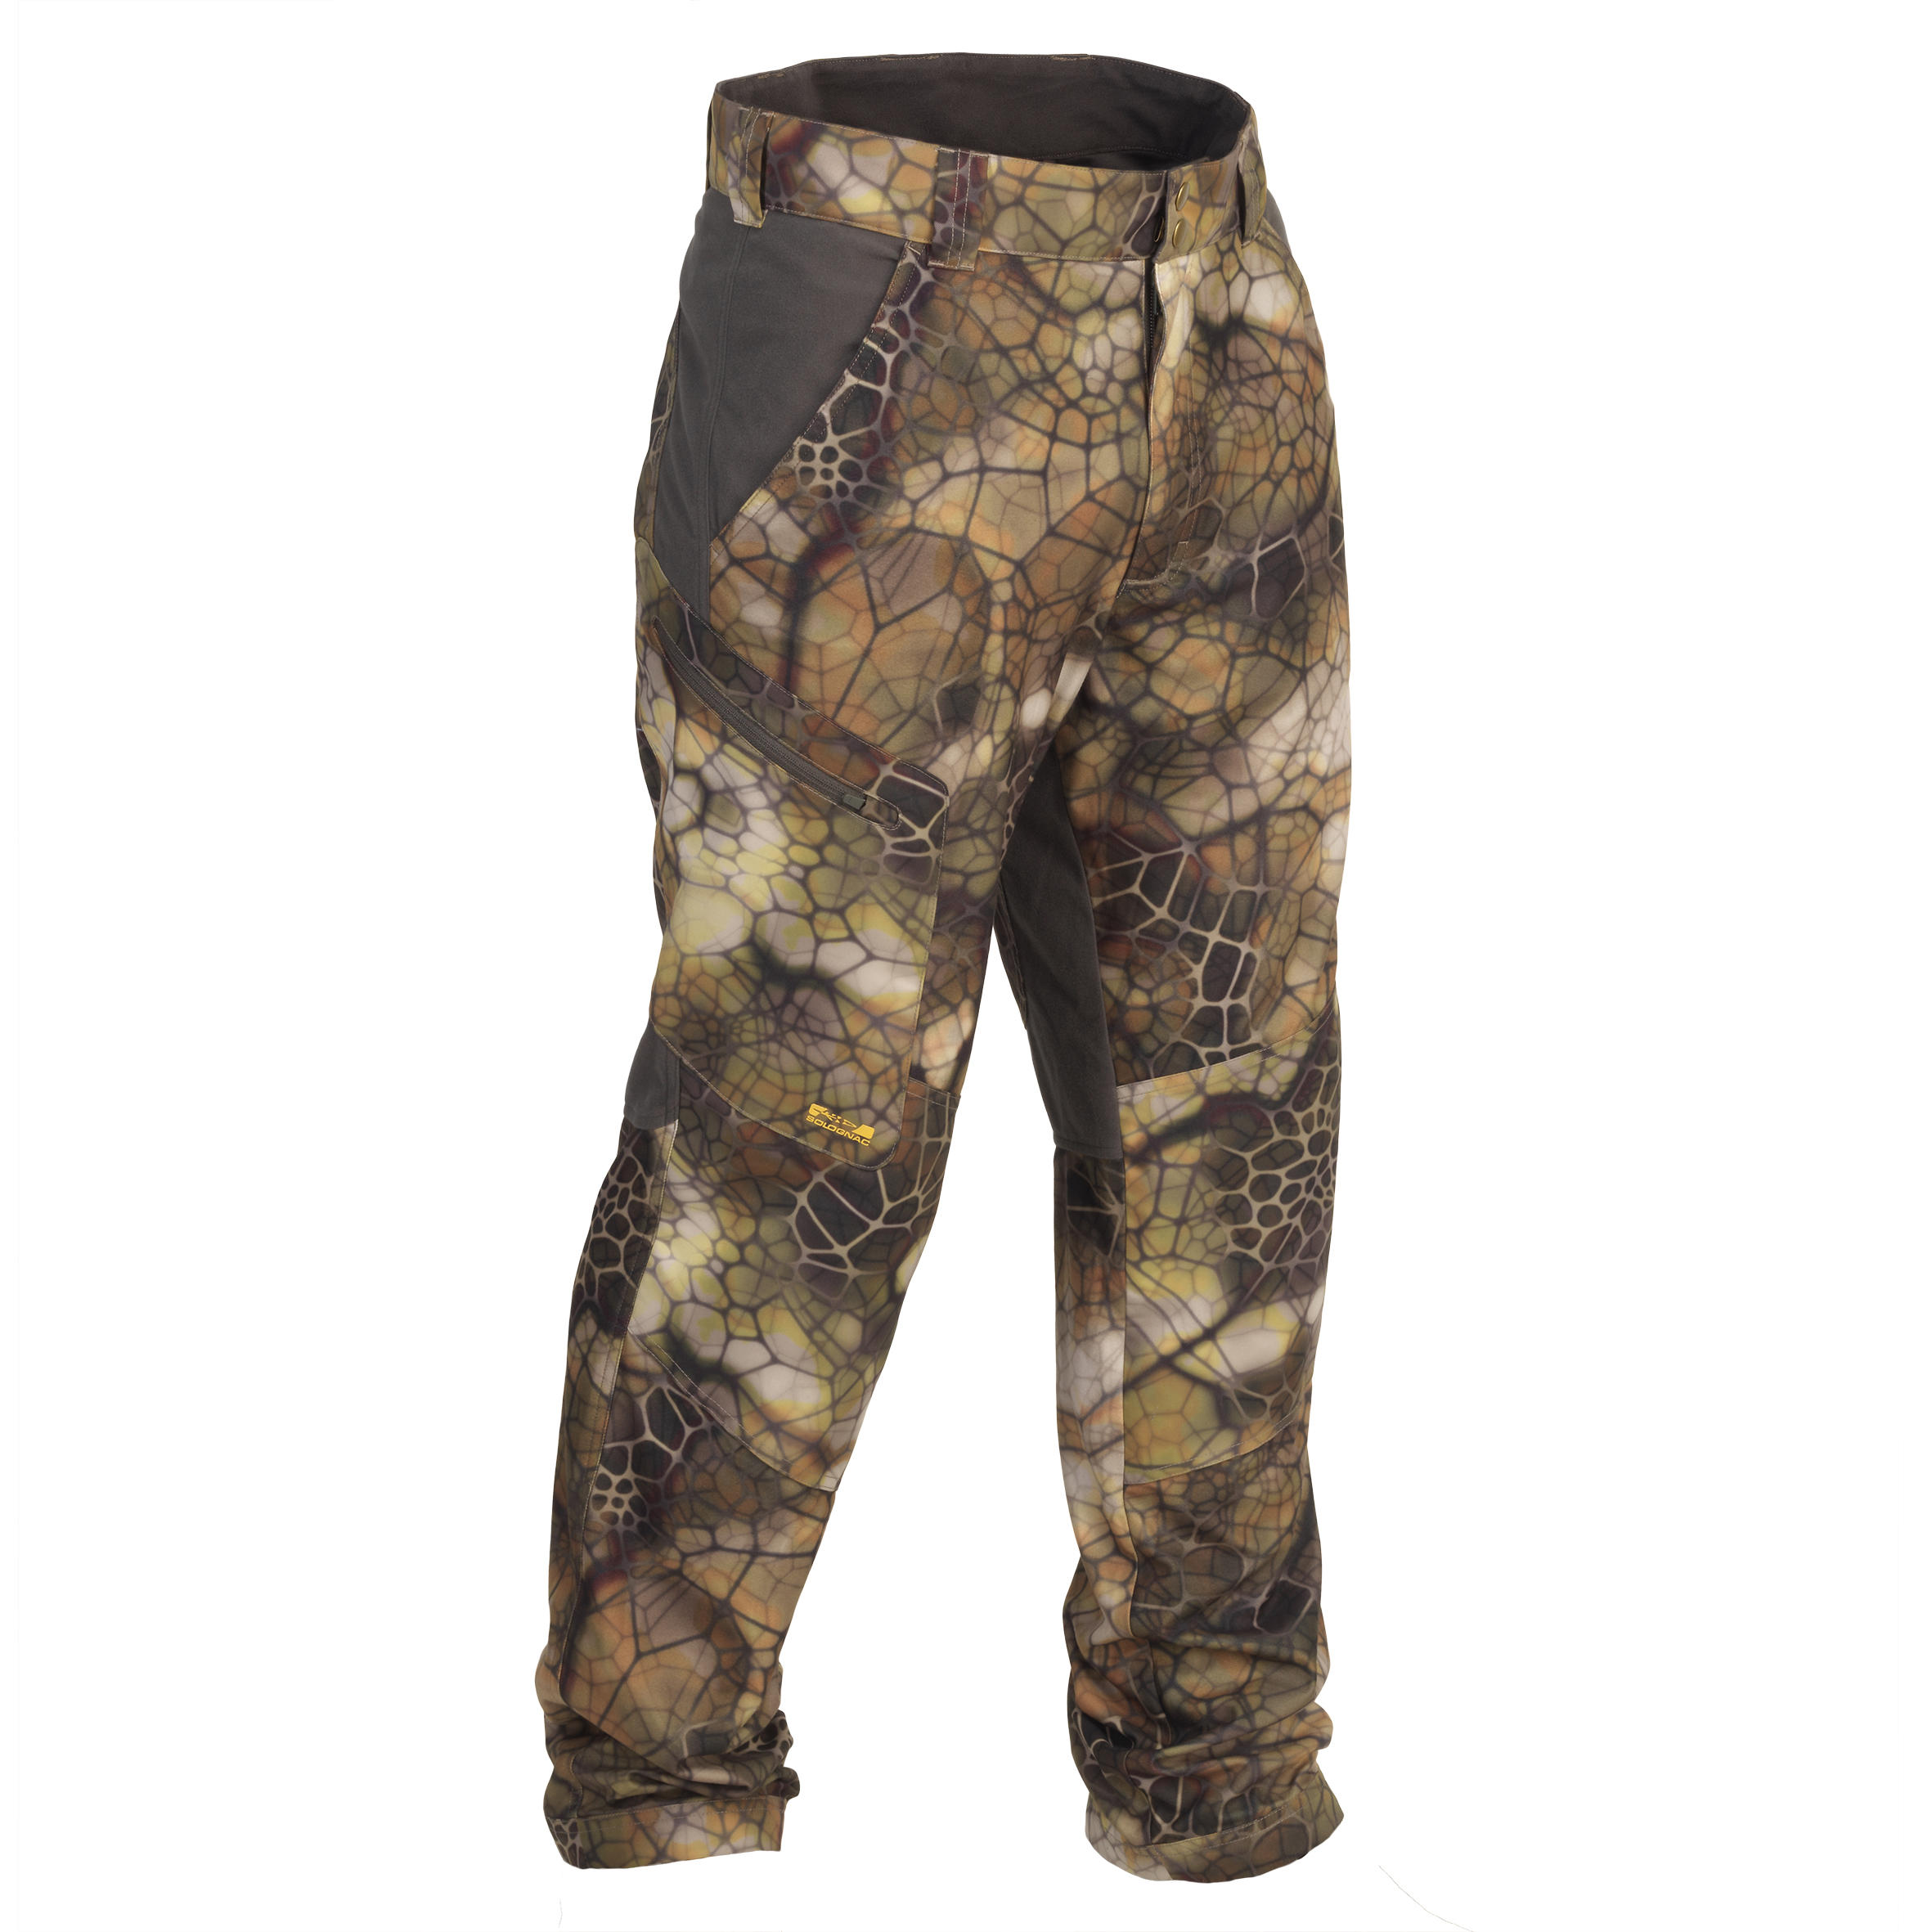 Actikam 500 Furtiv Camouflage Pants